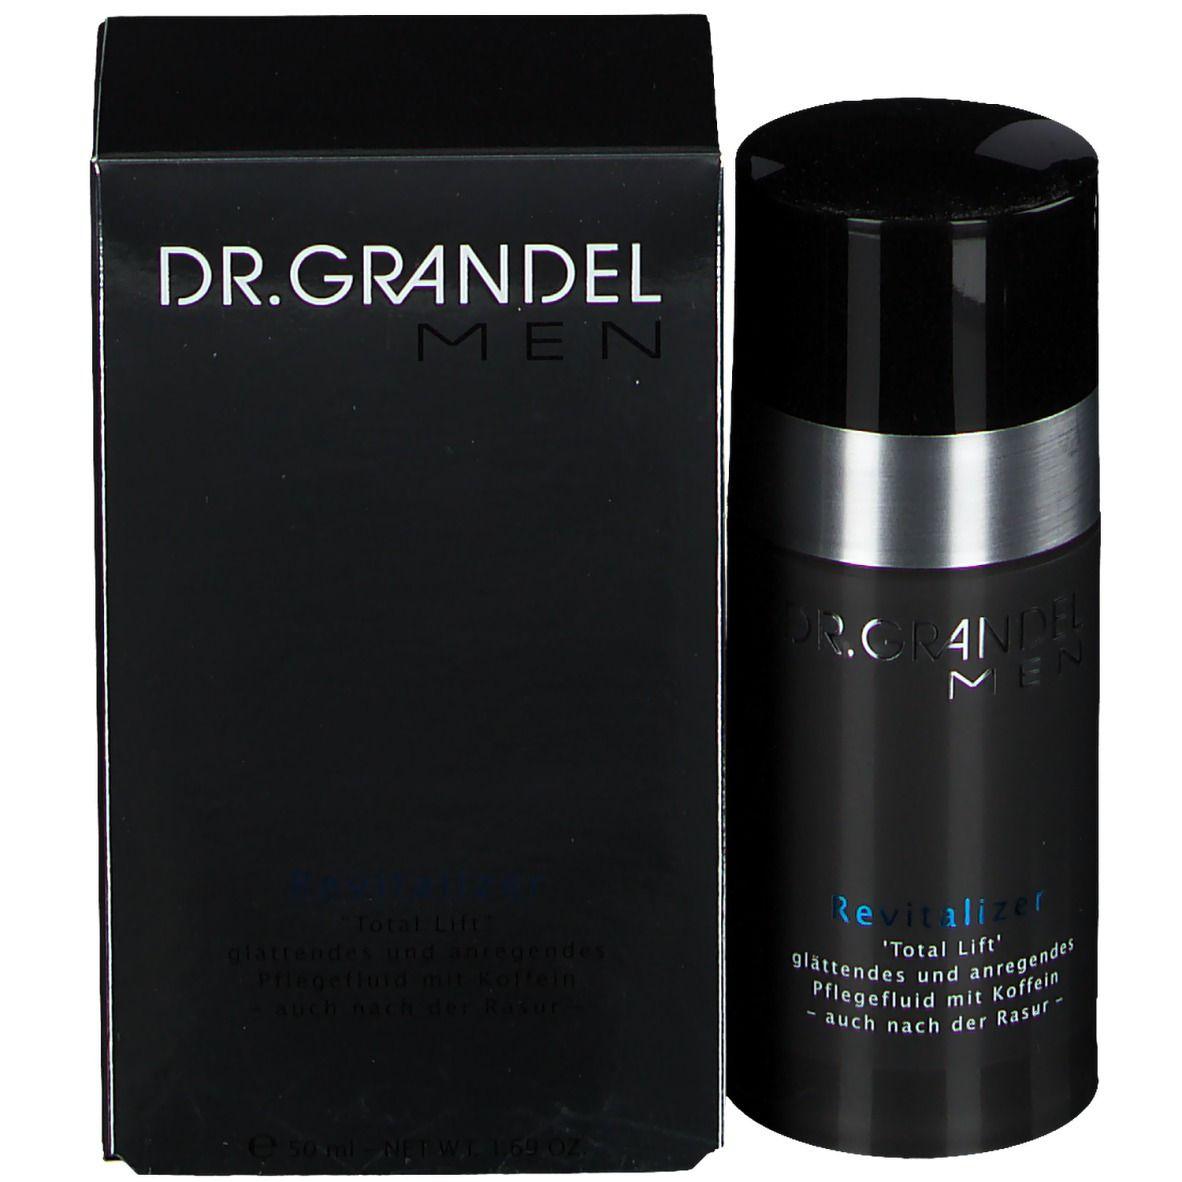 Dr. Grandel Men Revitalizer